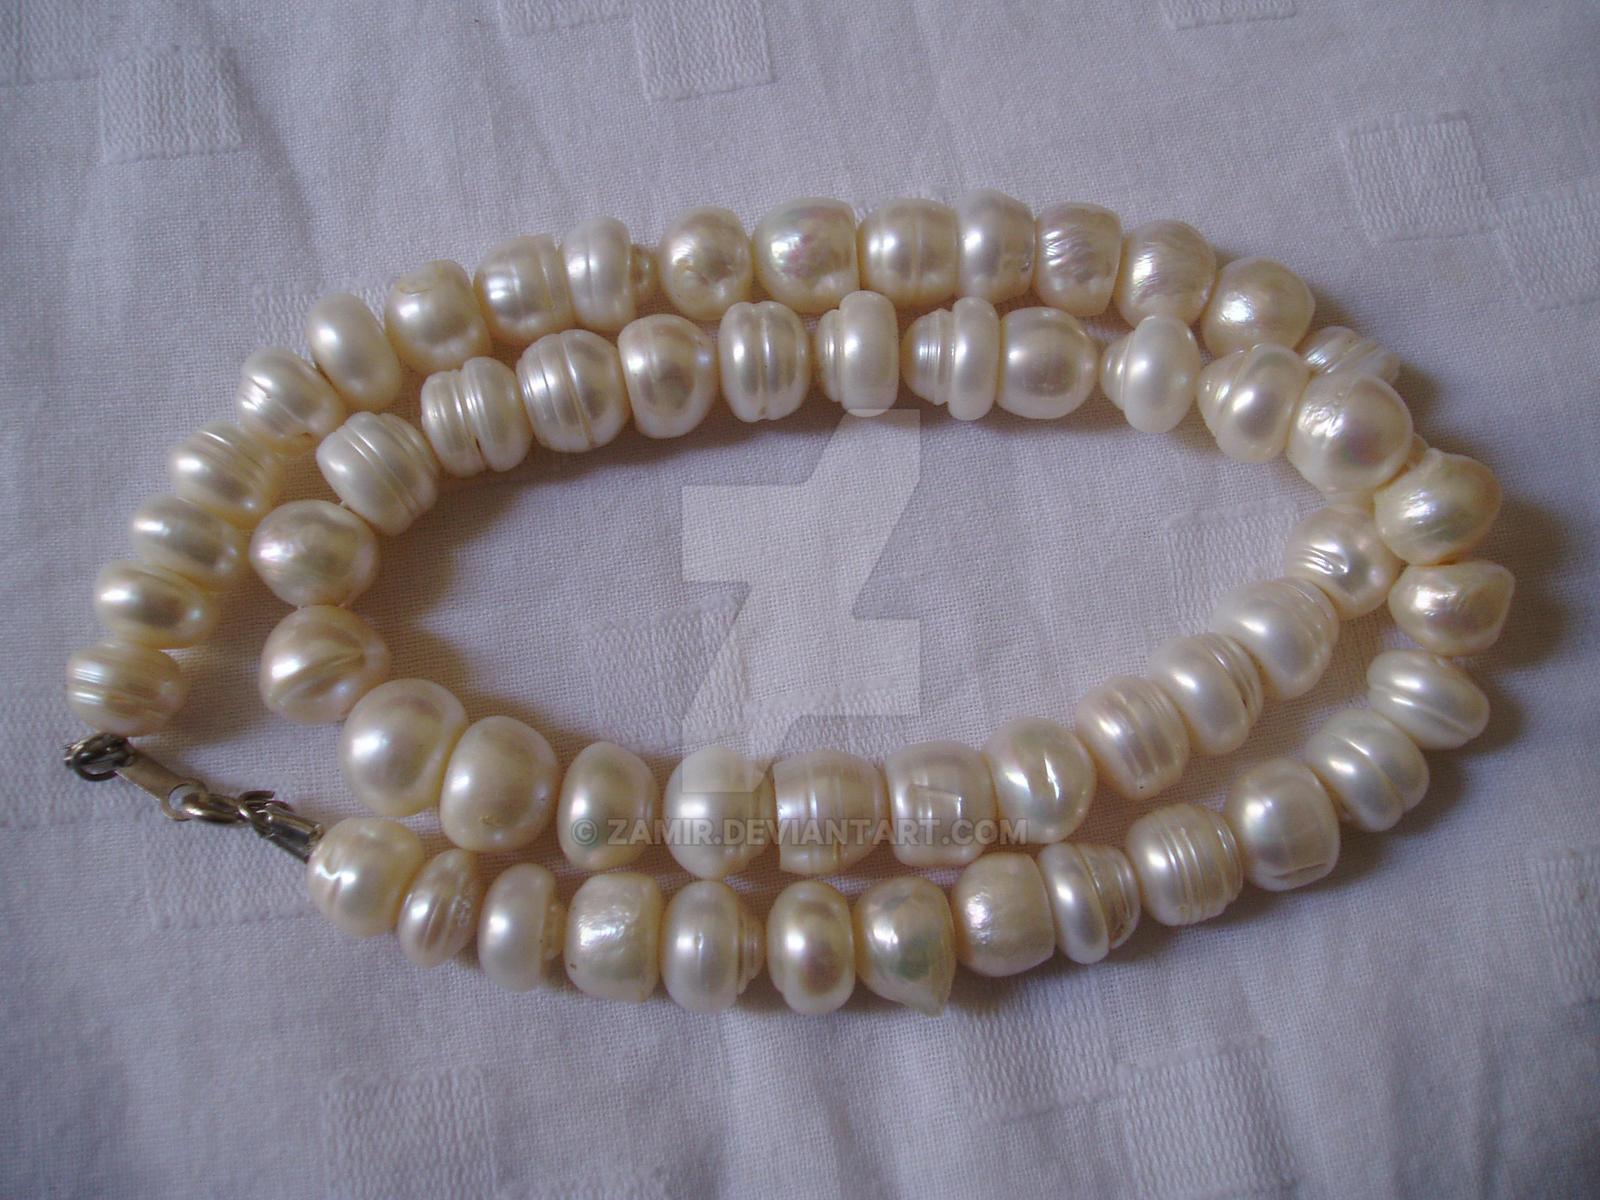 Pearl by zamir